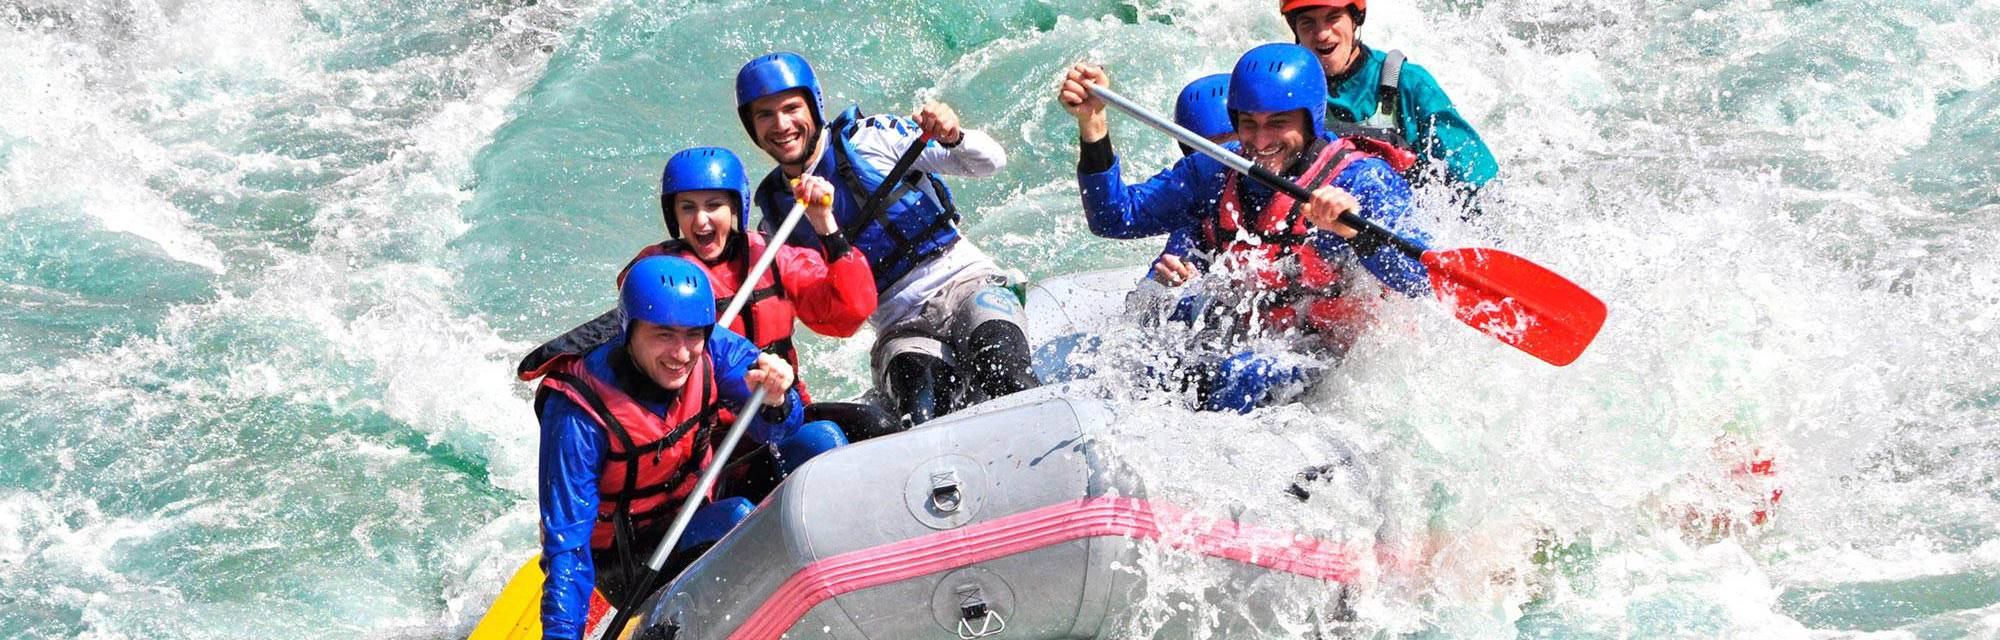 Rafting sul fiume Bussento, Marbella Club